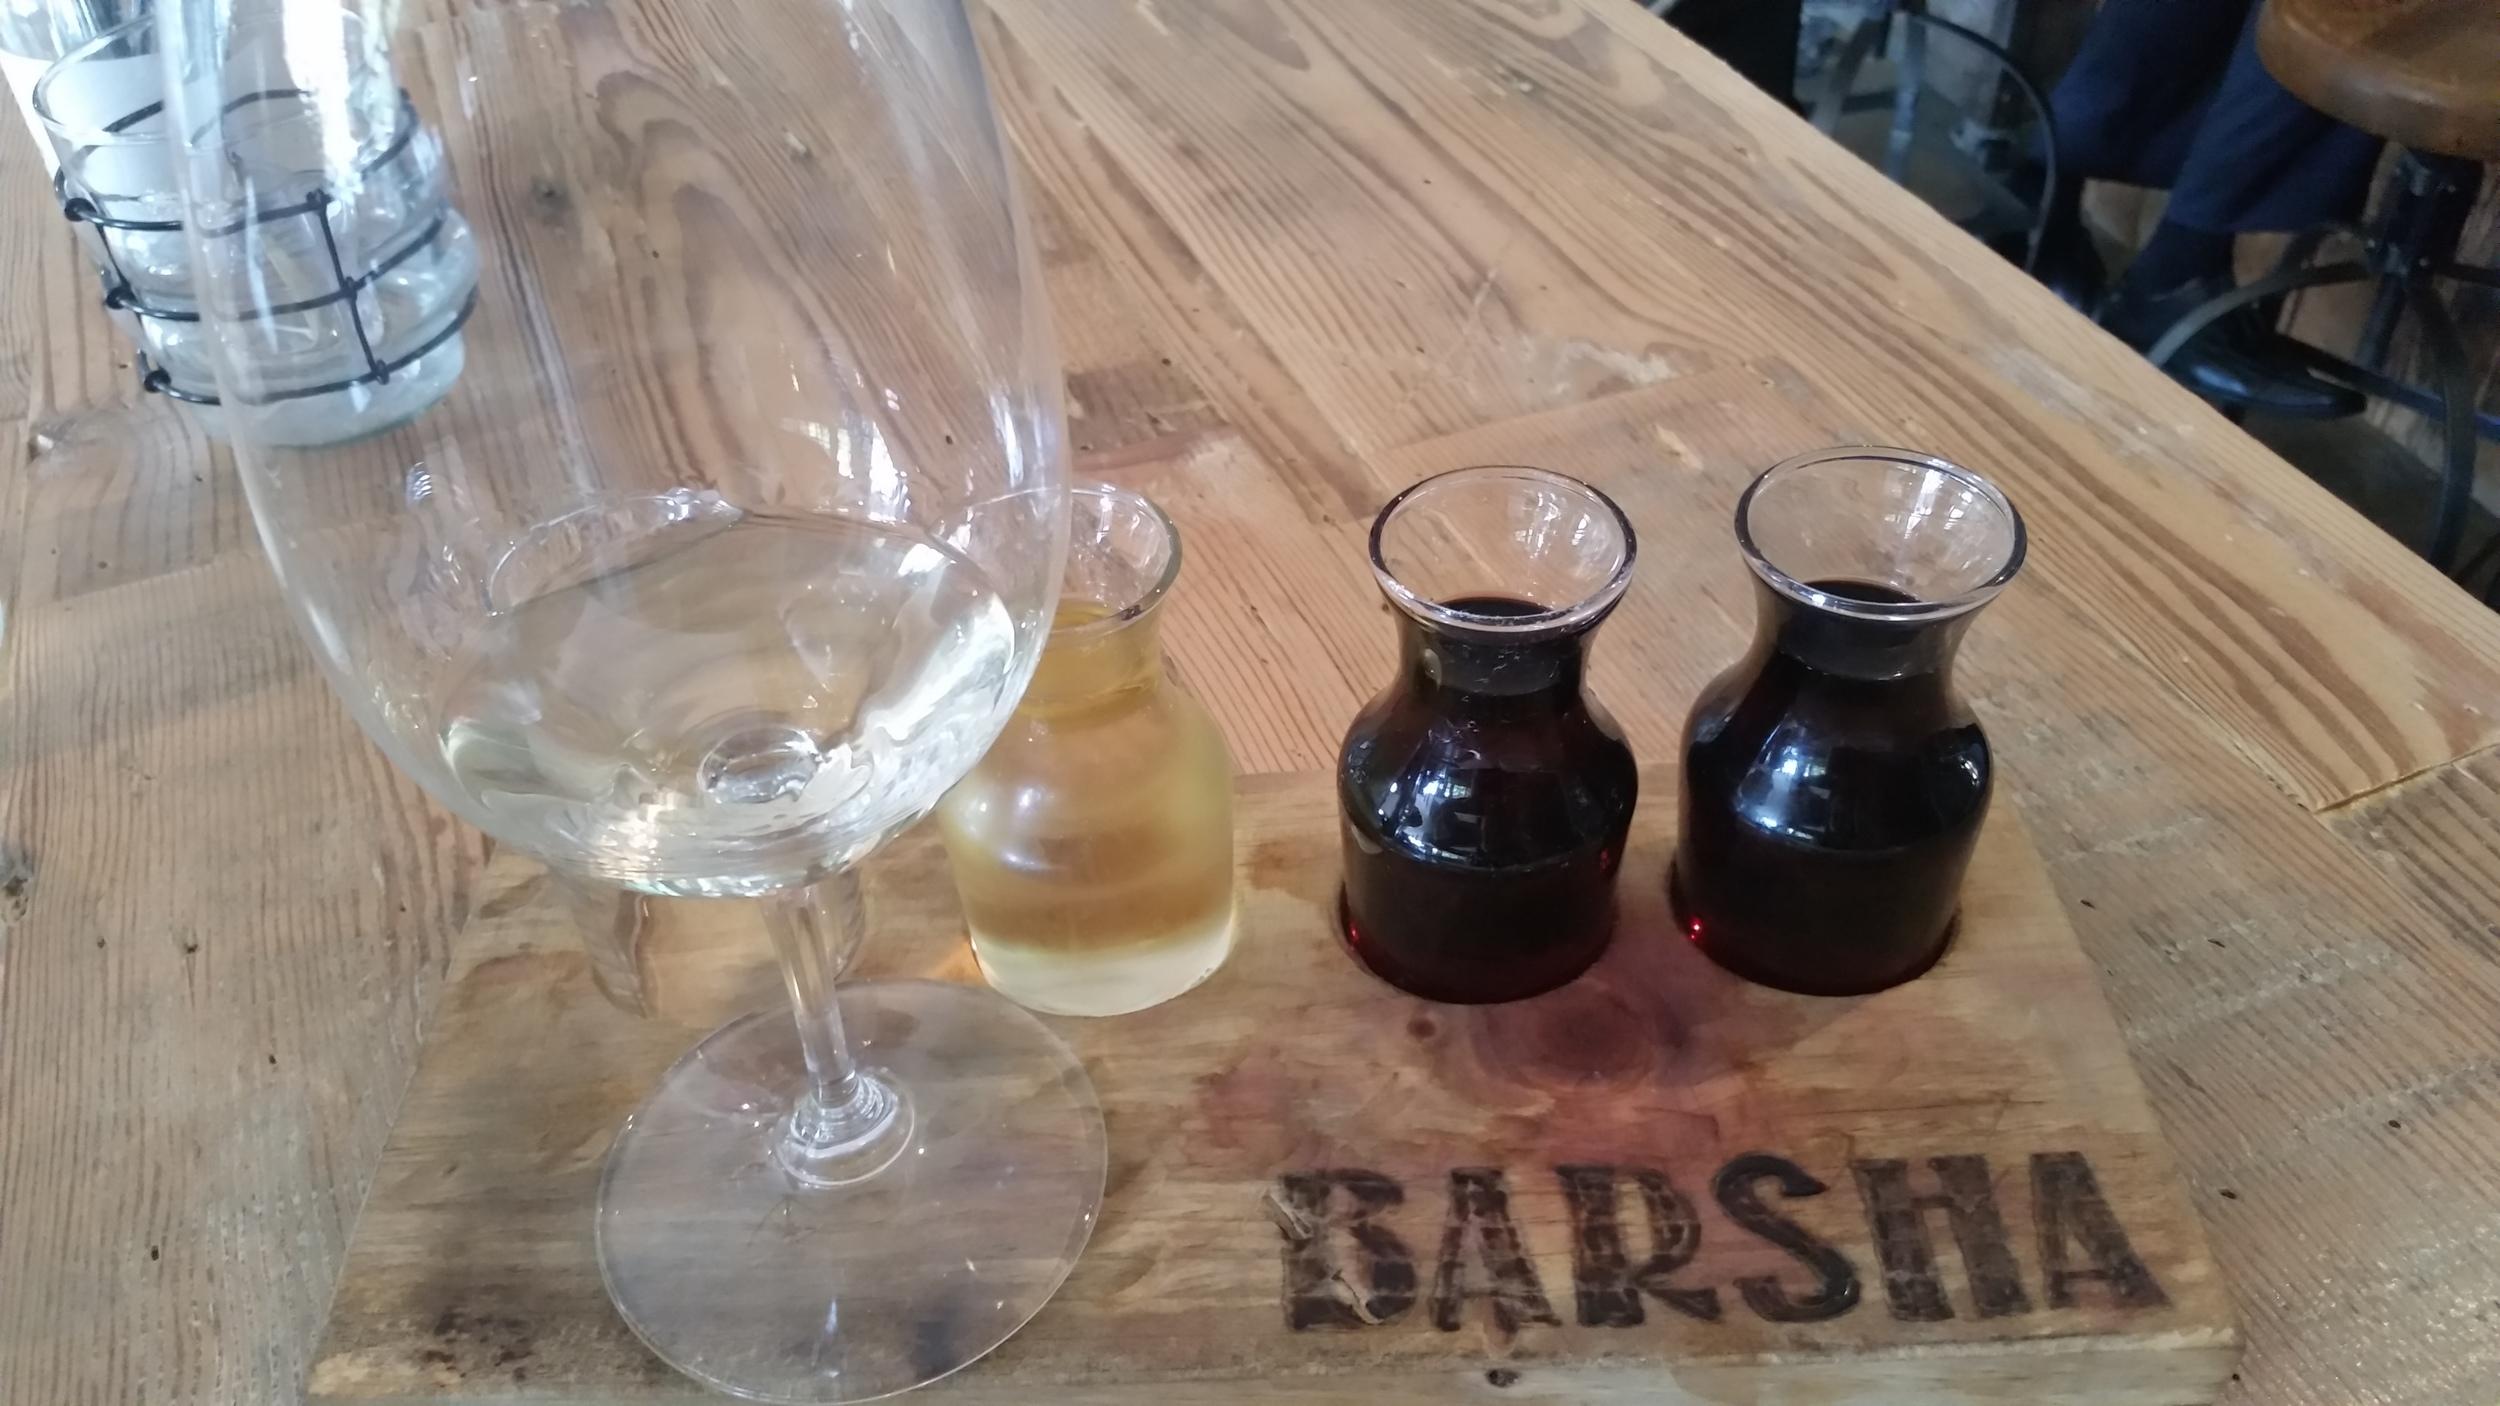 A wine flight at Barsha